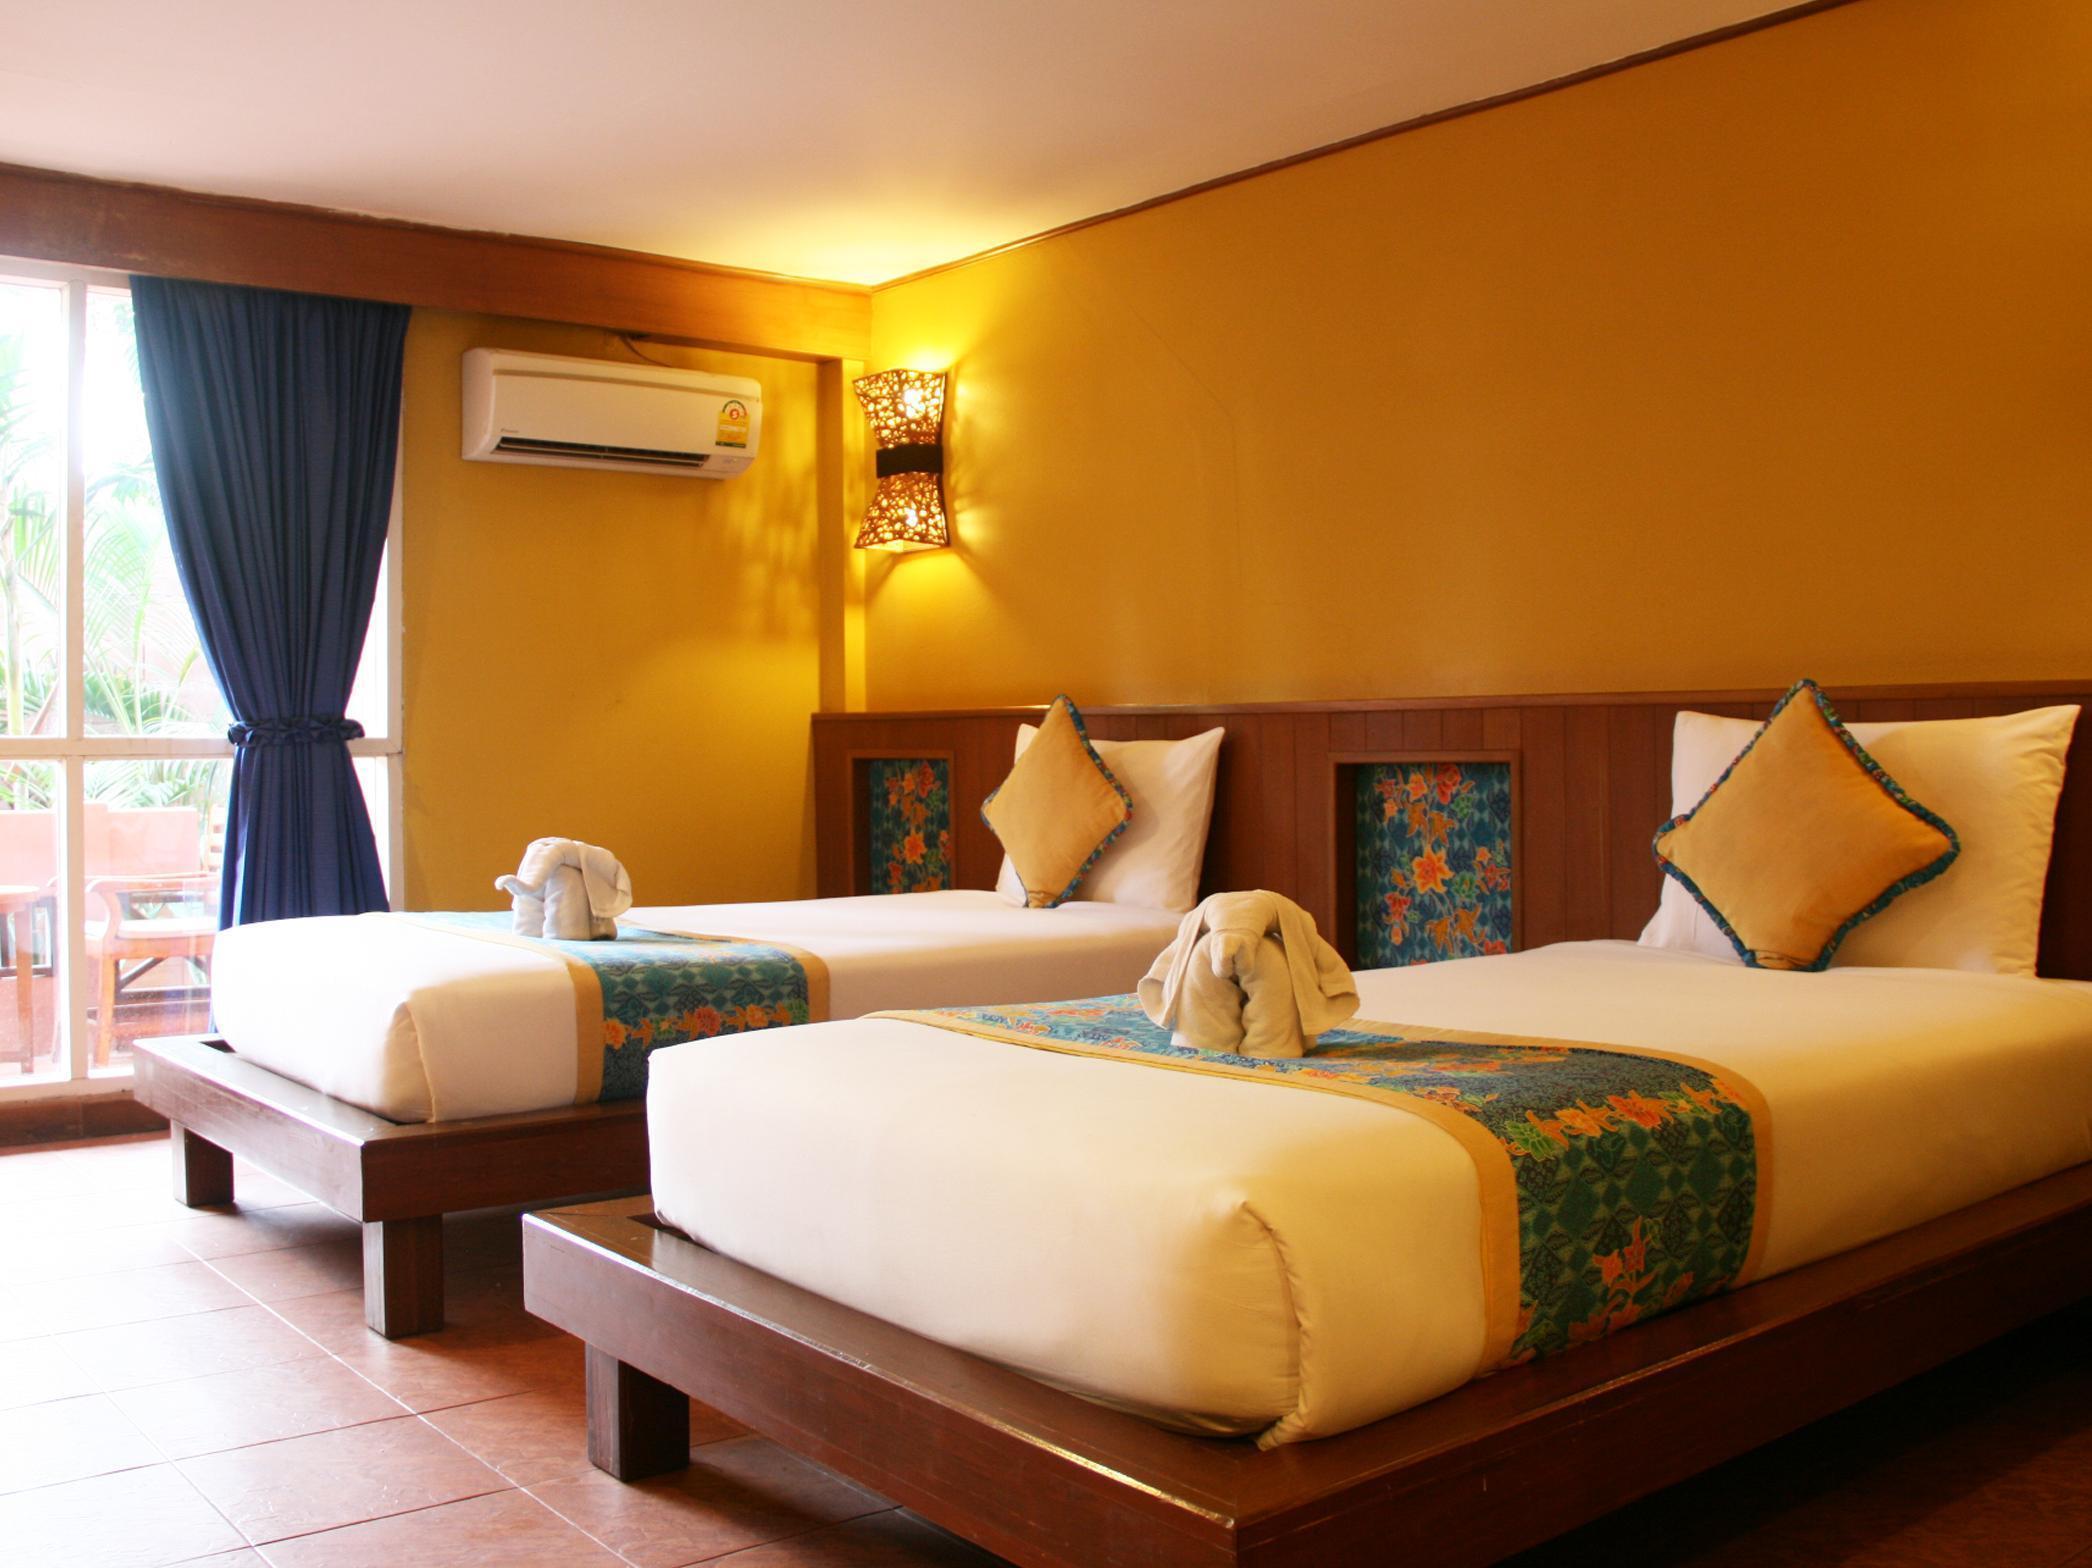 هتل لوما ریزورت اند اسپا پاتایا